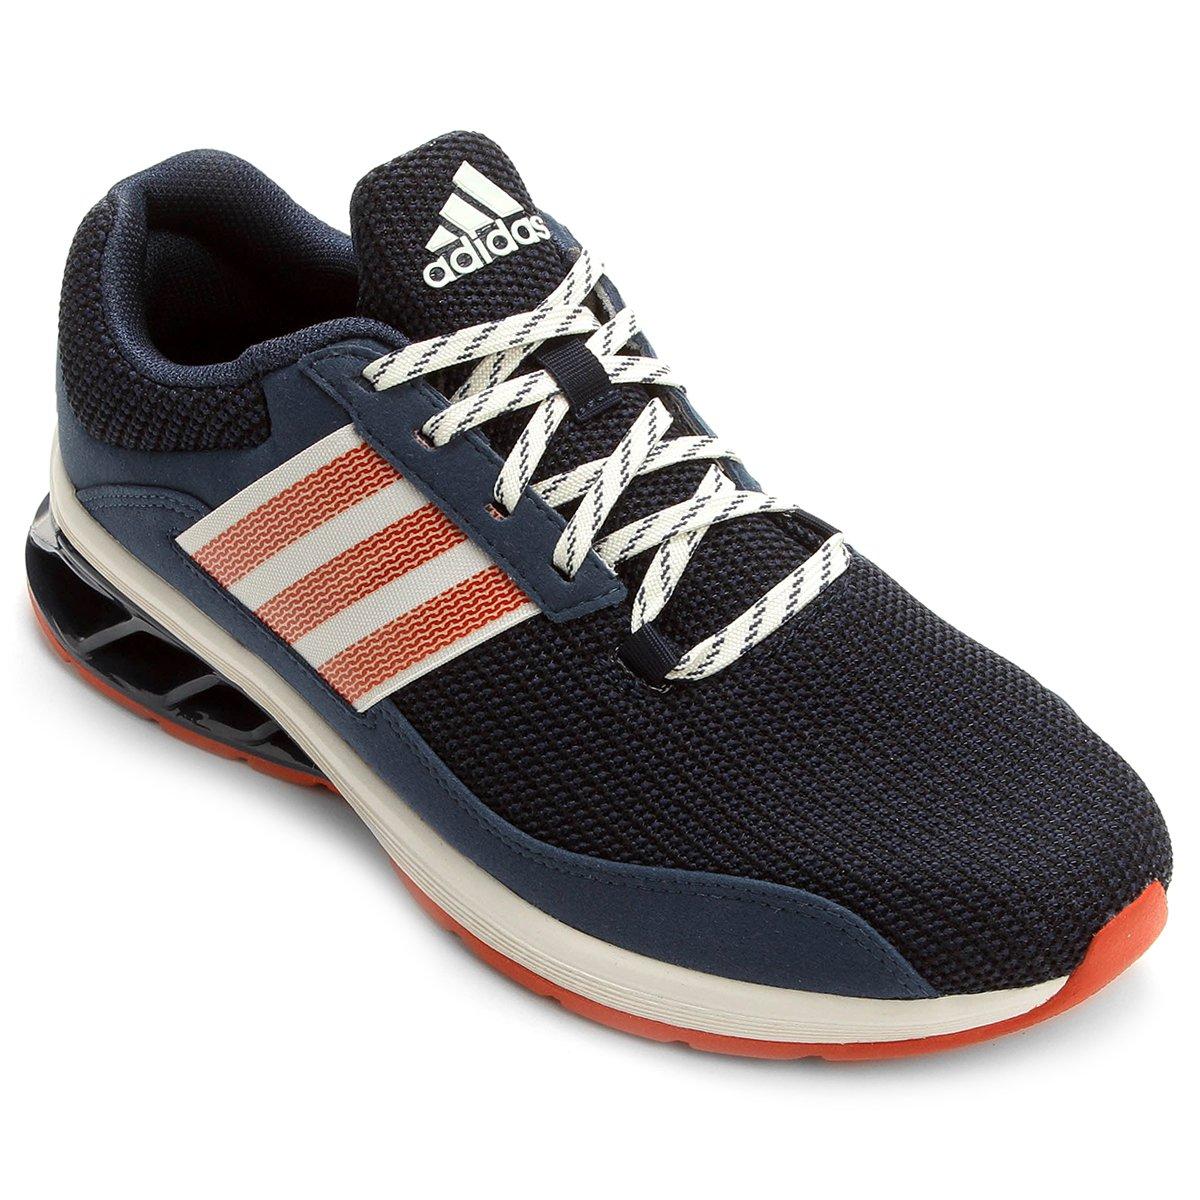 8d911832d06 Tênis Adidas Runway Masculino - Compre Agora